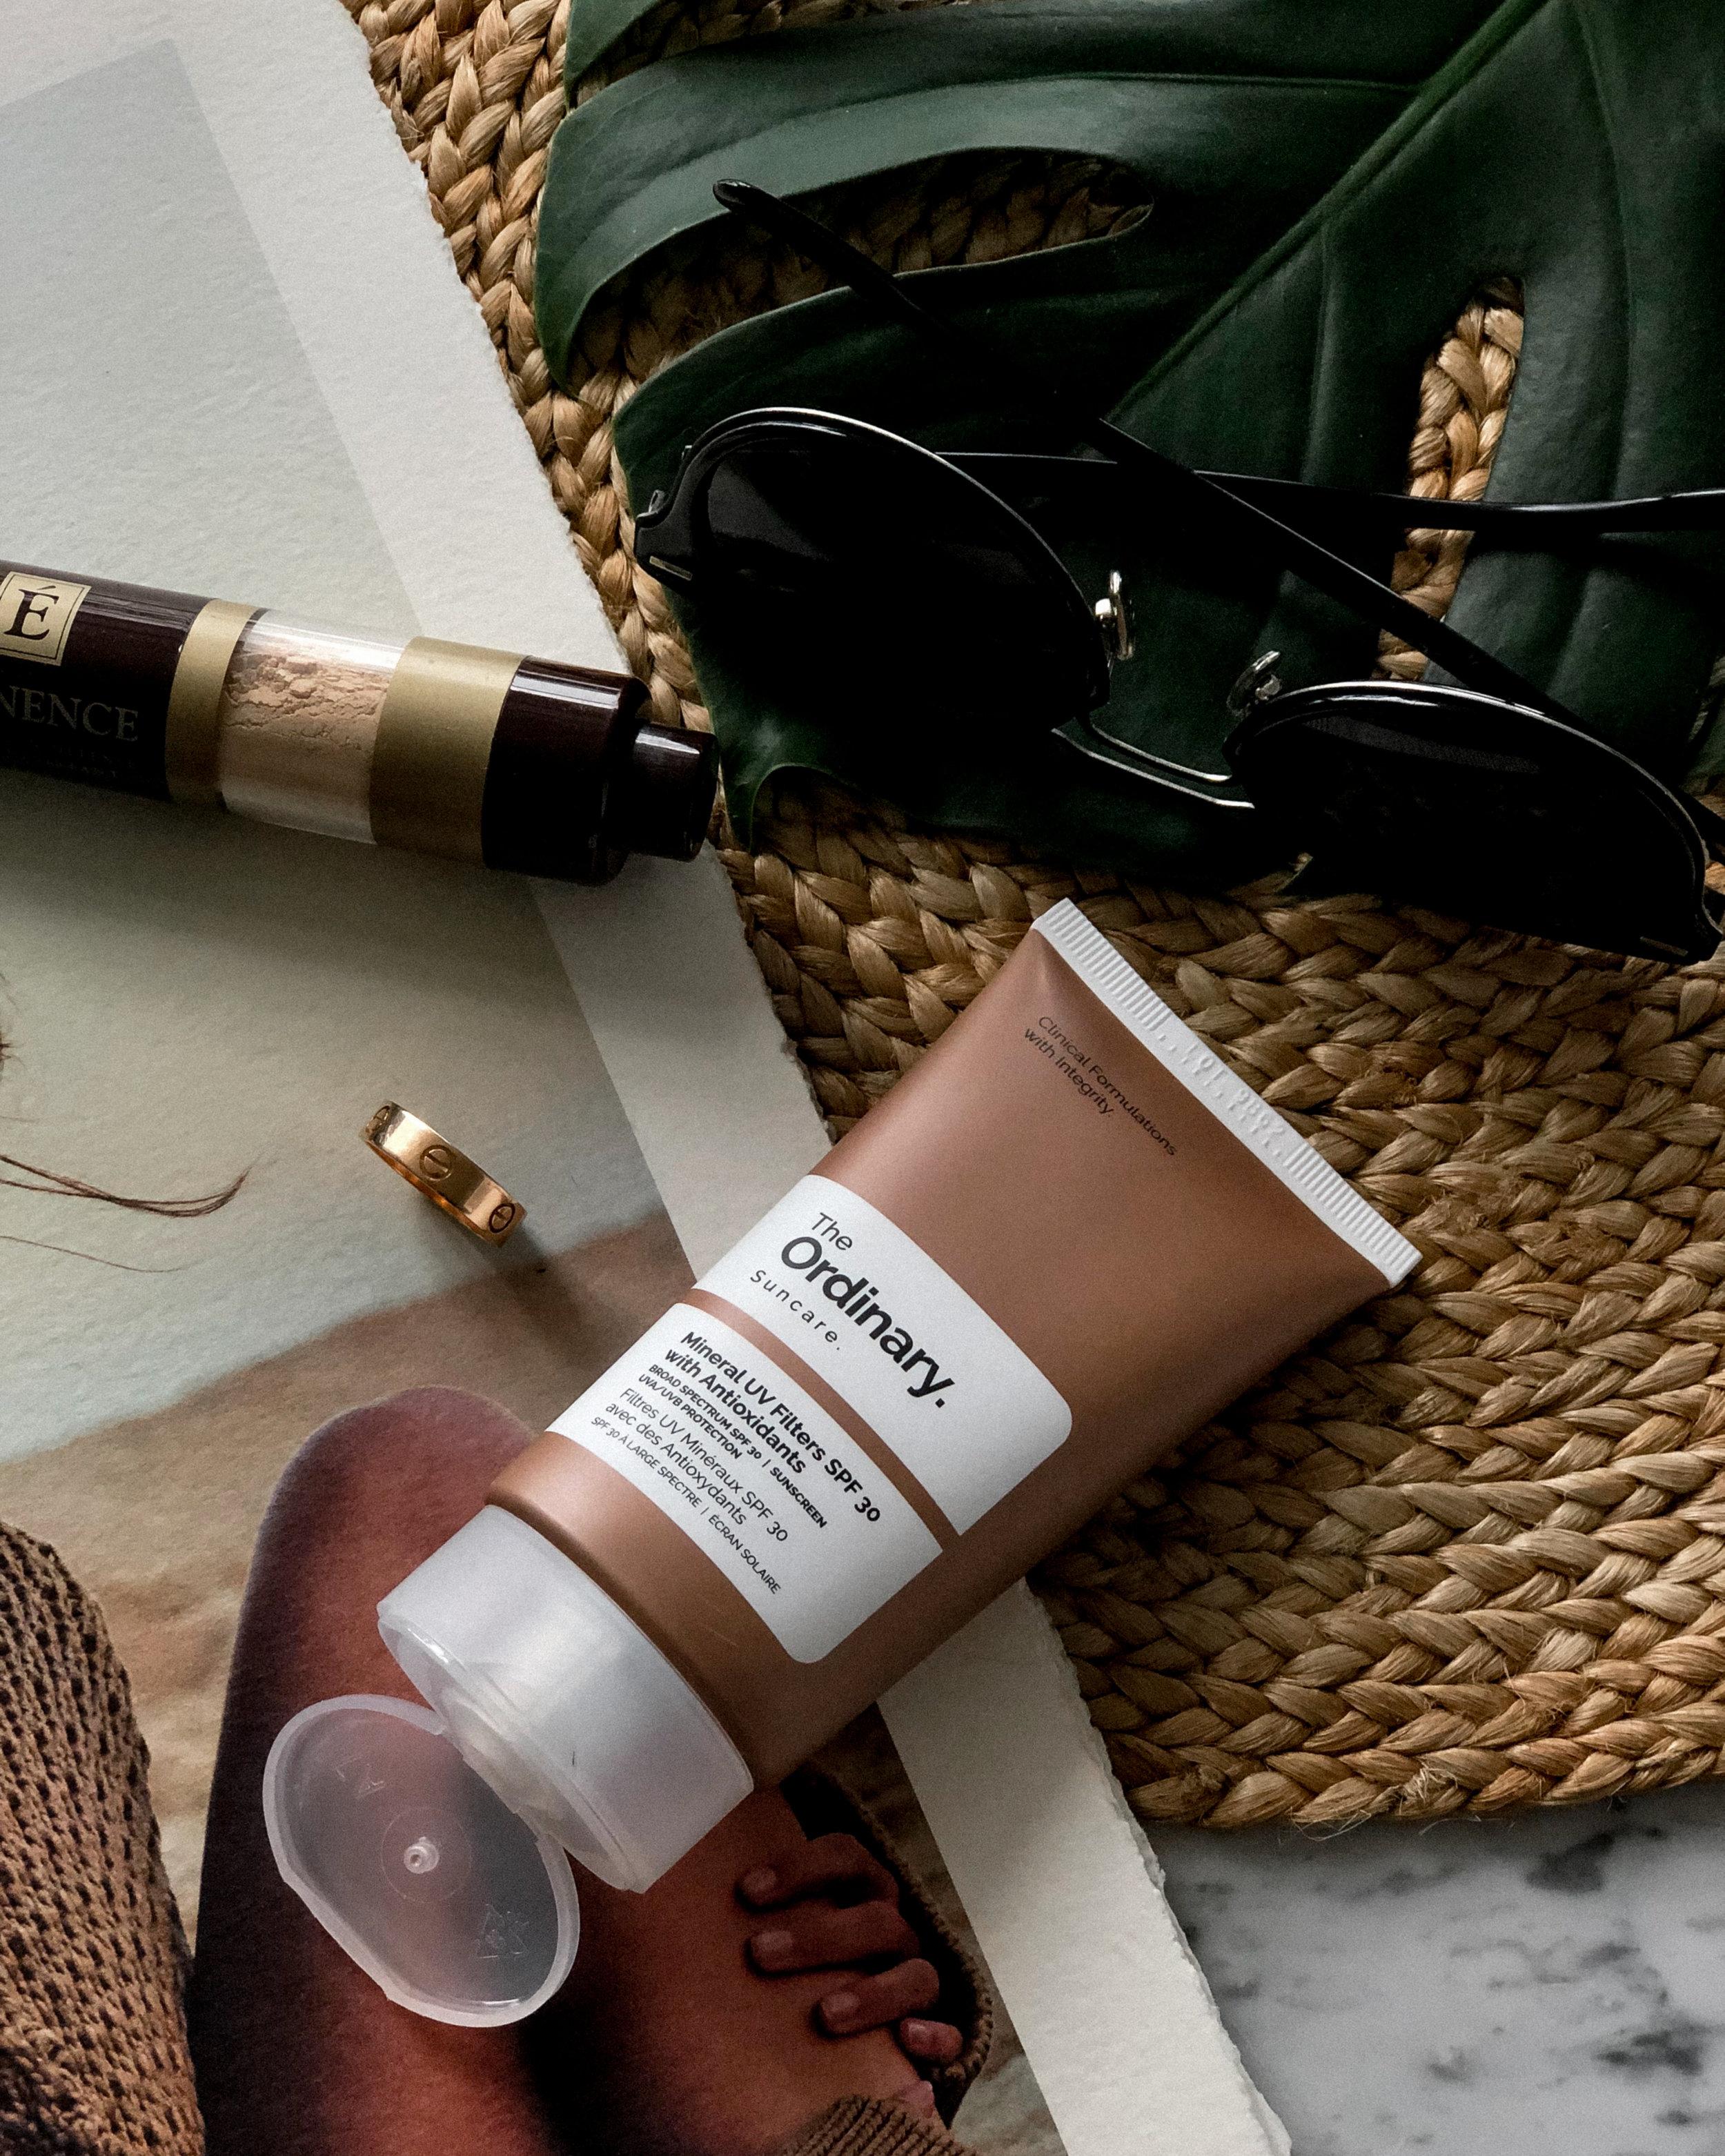 the-ordinary-mineral-sunscreen.jpg